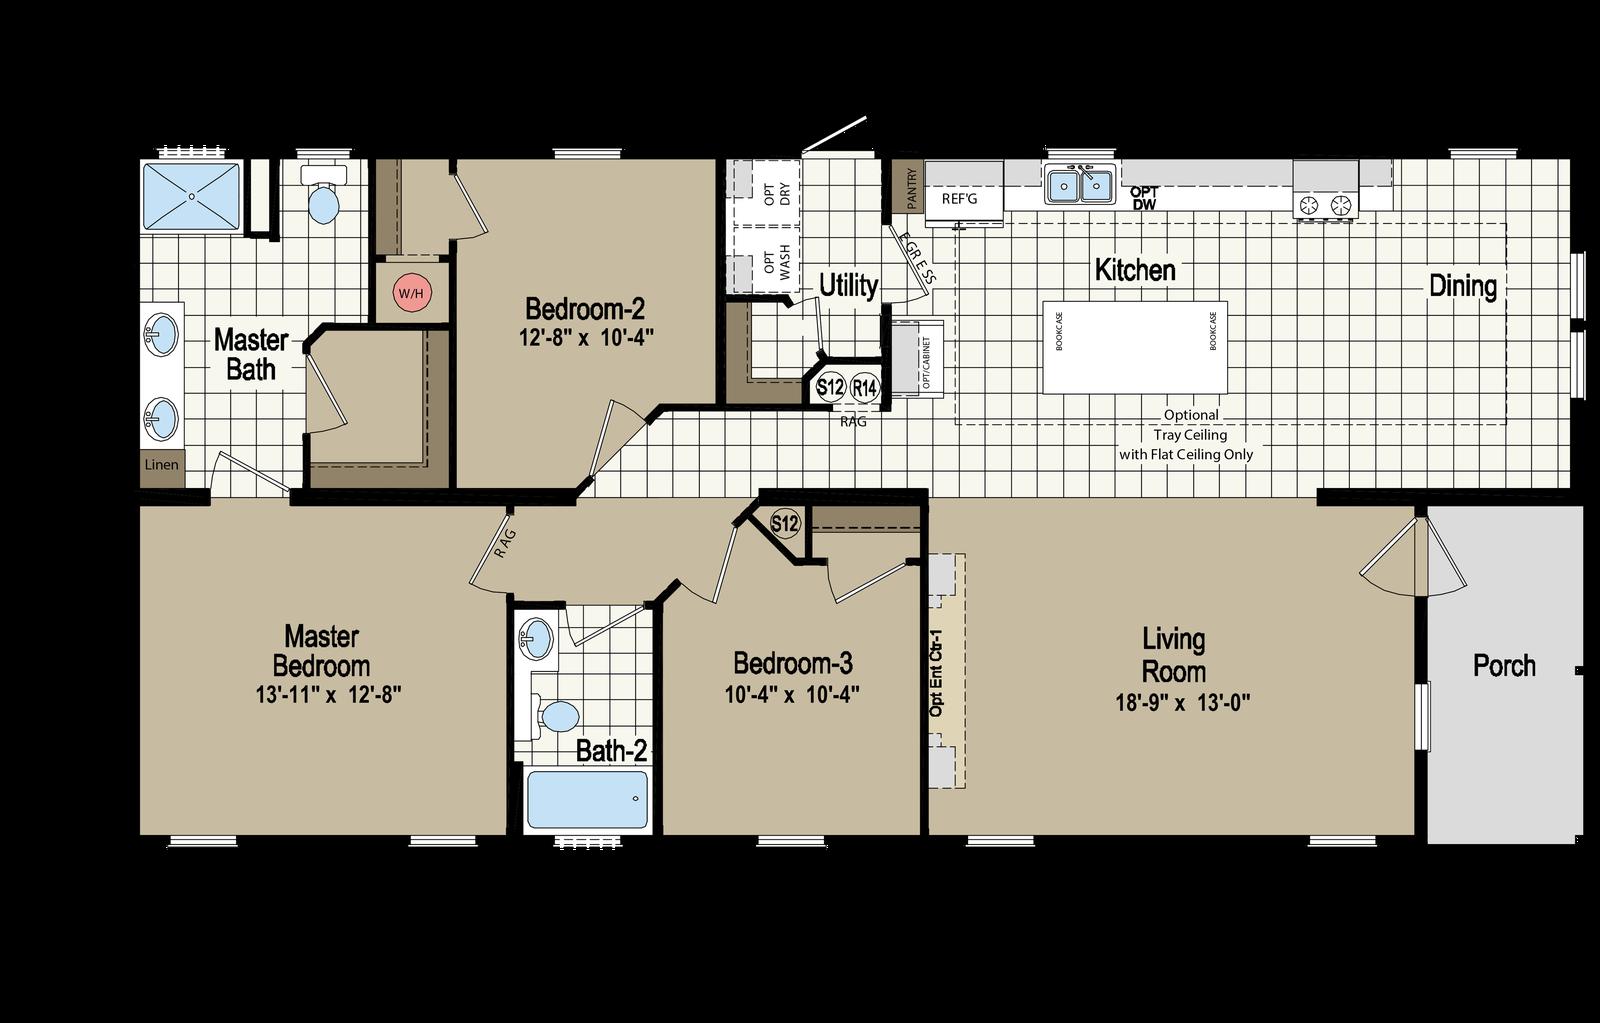 Homes Of Merit >> Homc 4563b Built By Homes Of Merit In Lake City Fl View